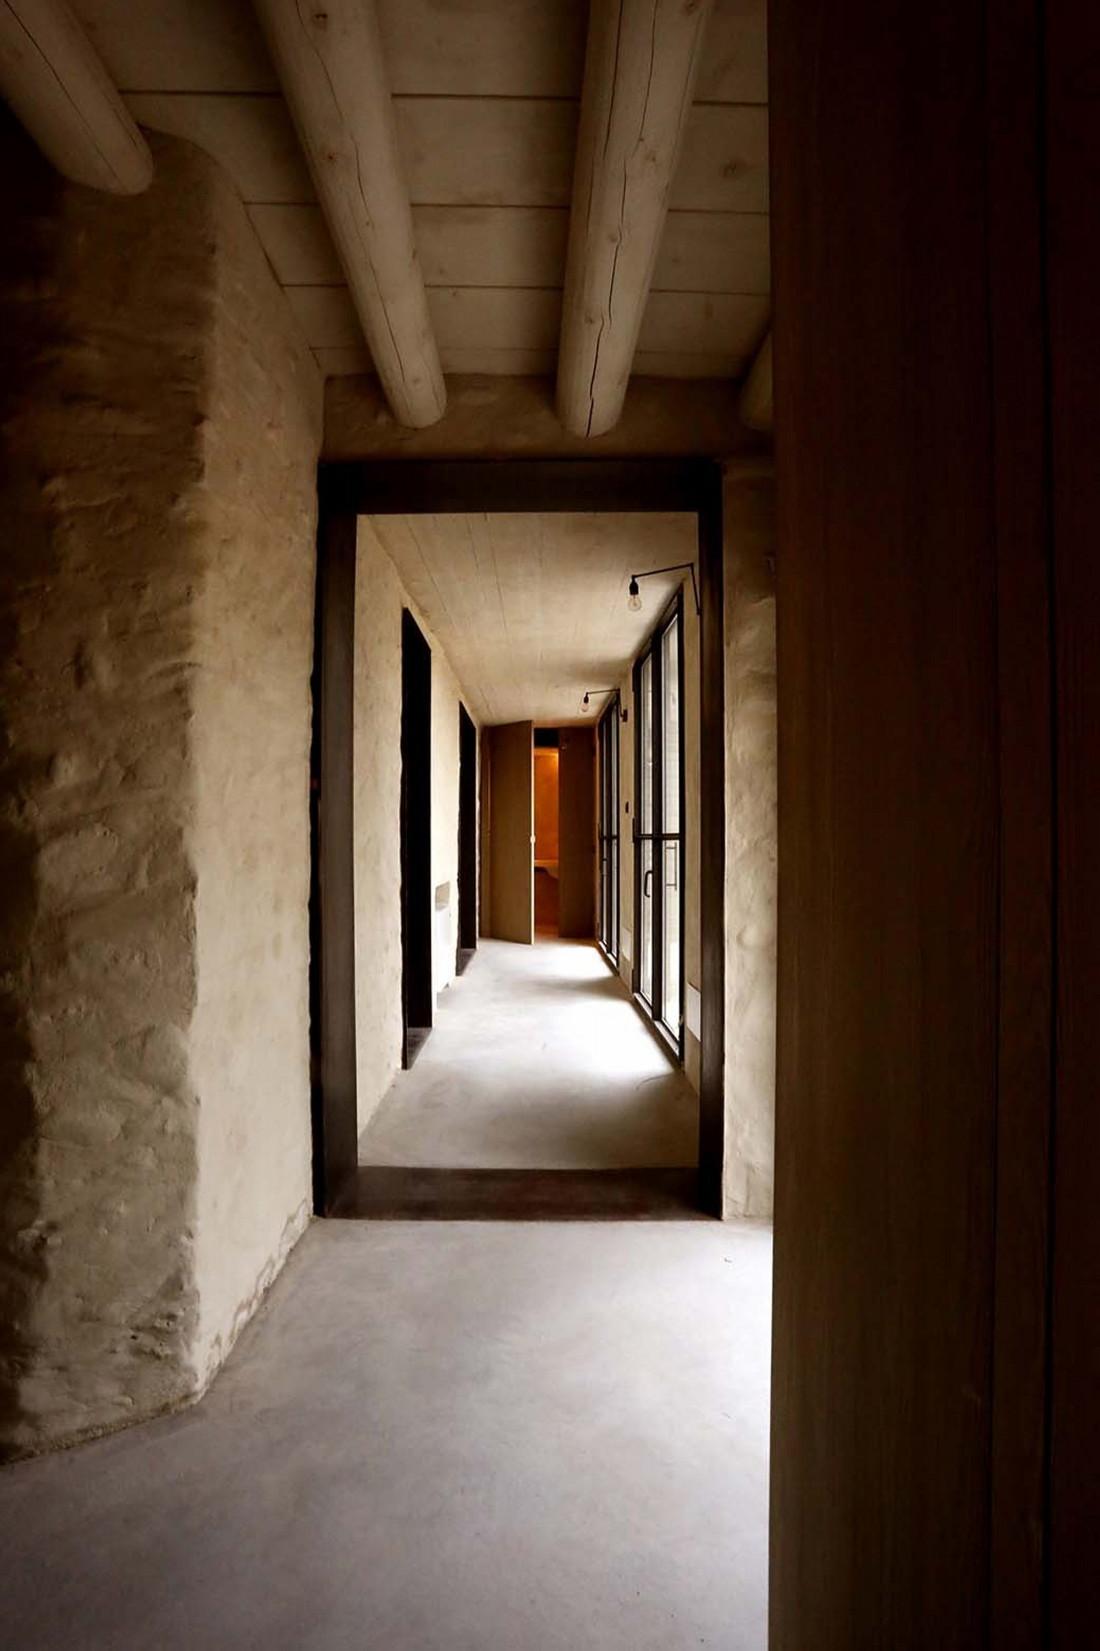 Реставрация виллы Brolo Saccomani в Италии от студии Bricolo Falsarella 5